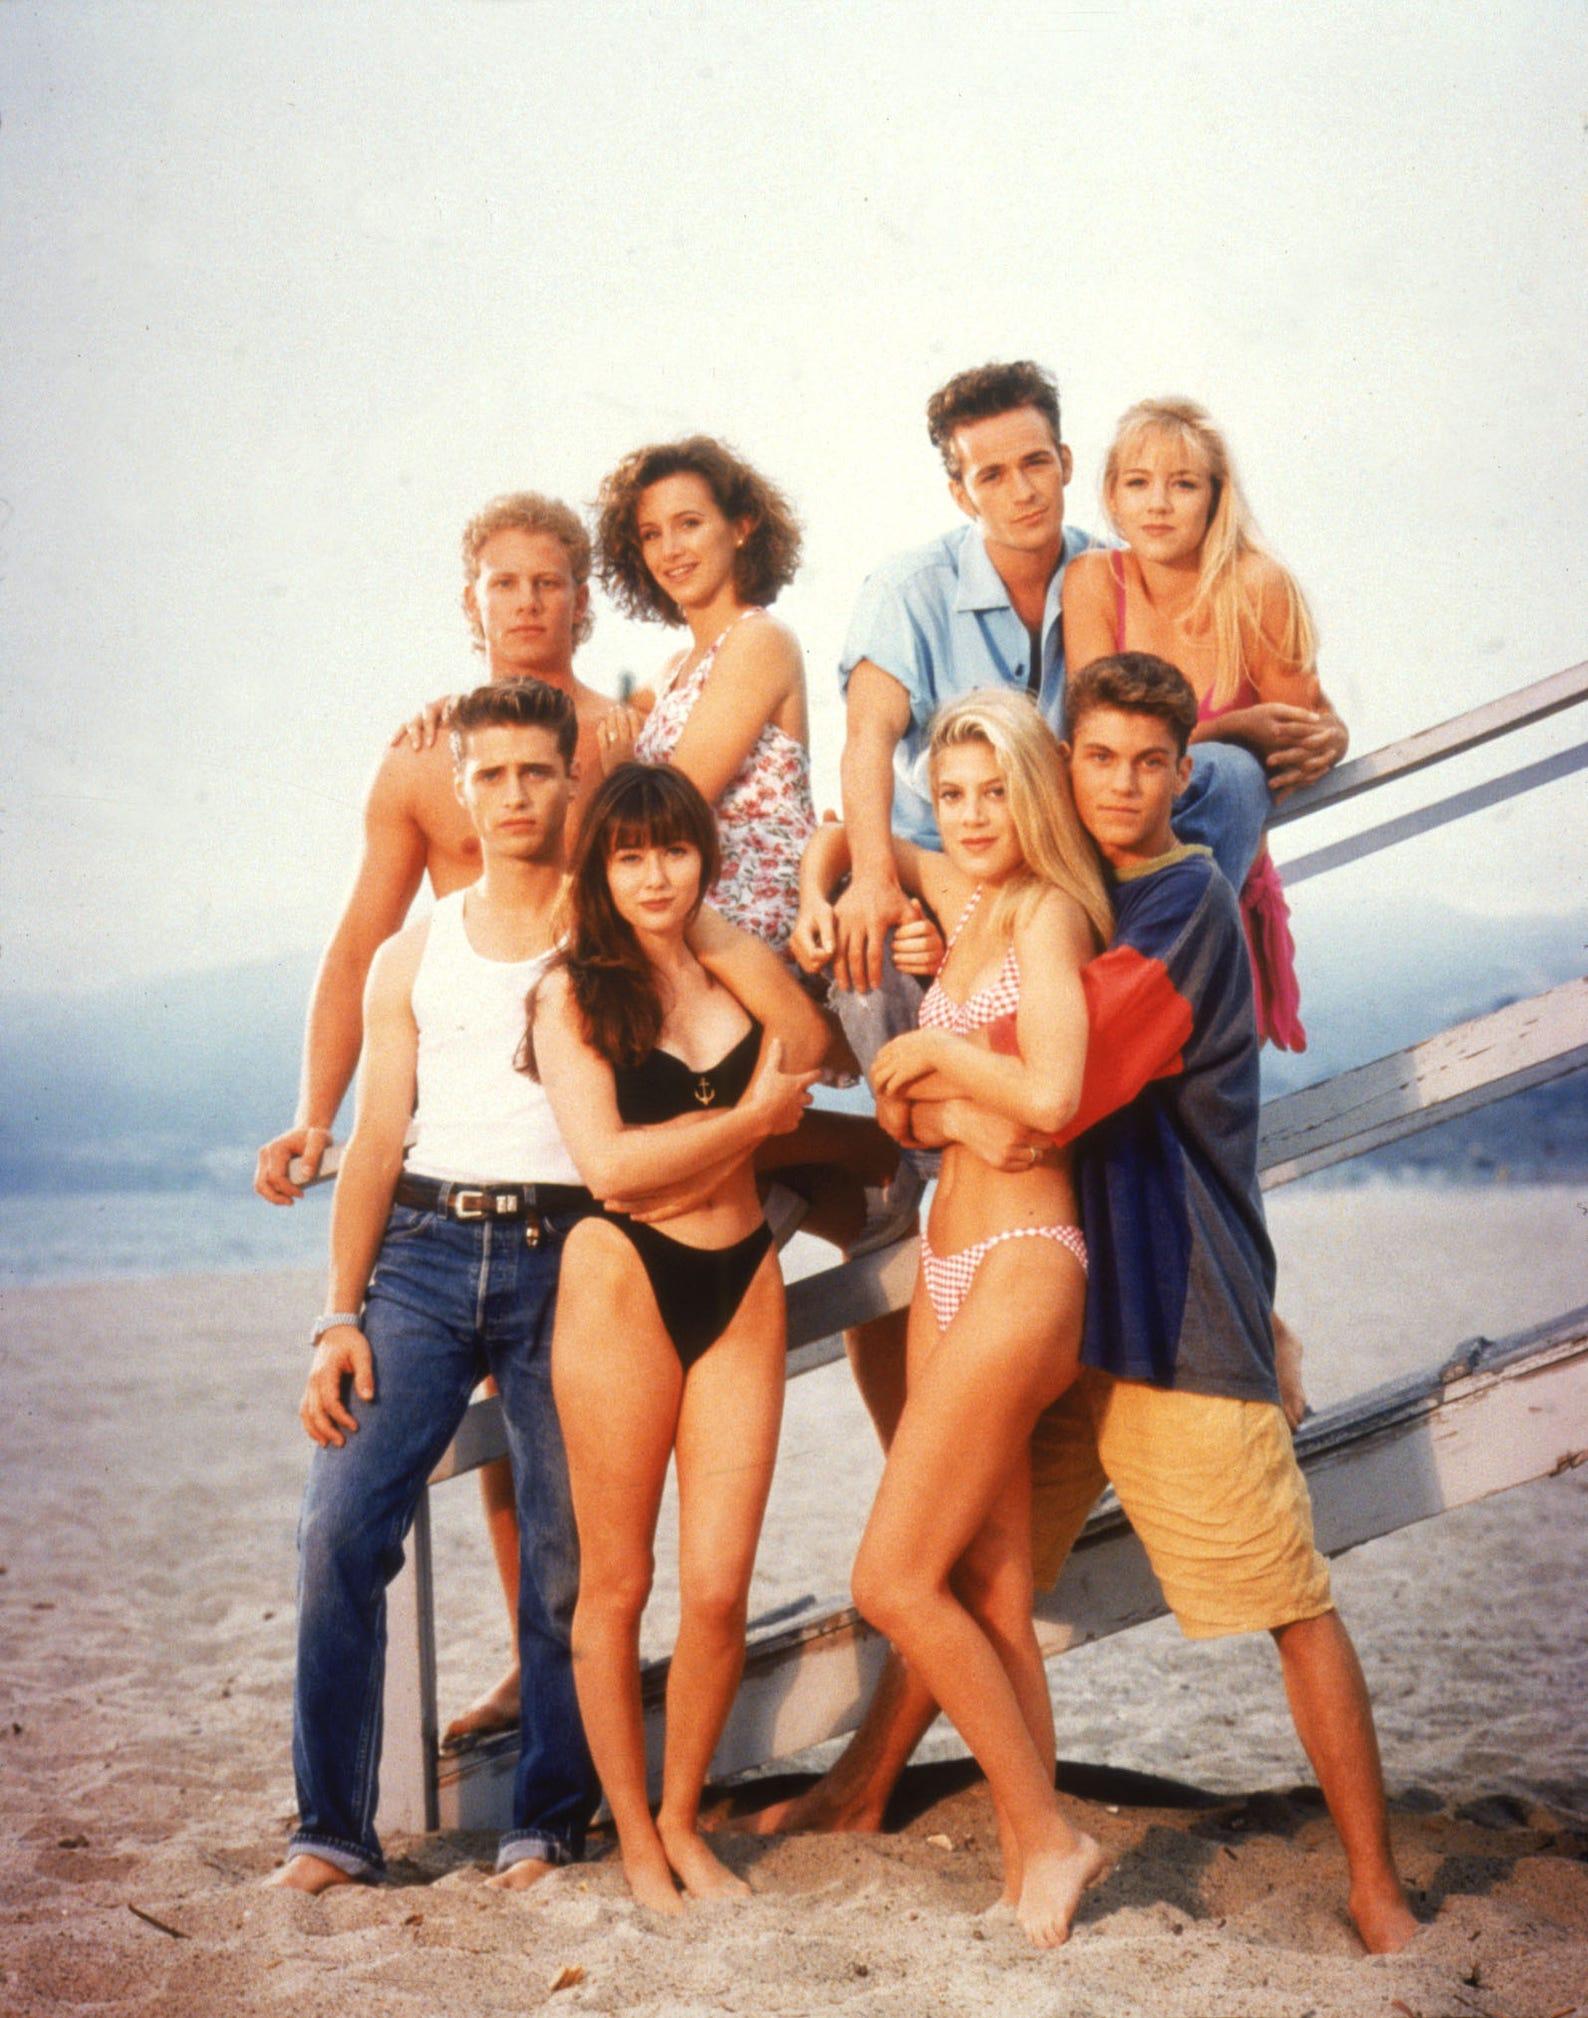 Beverly hills cast 90210 Beverly Hills,